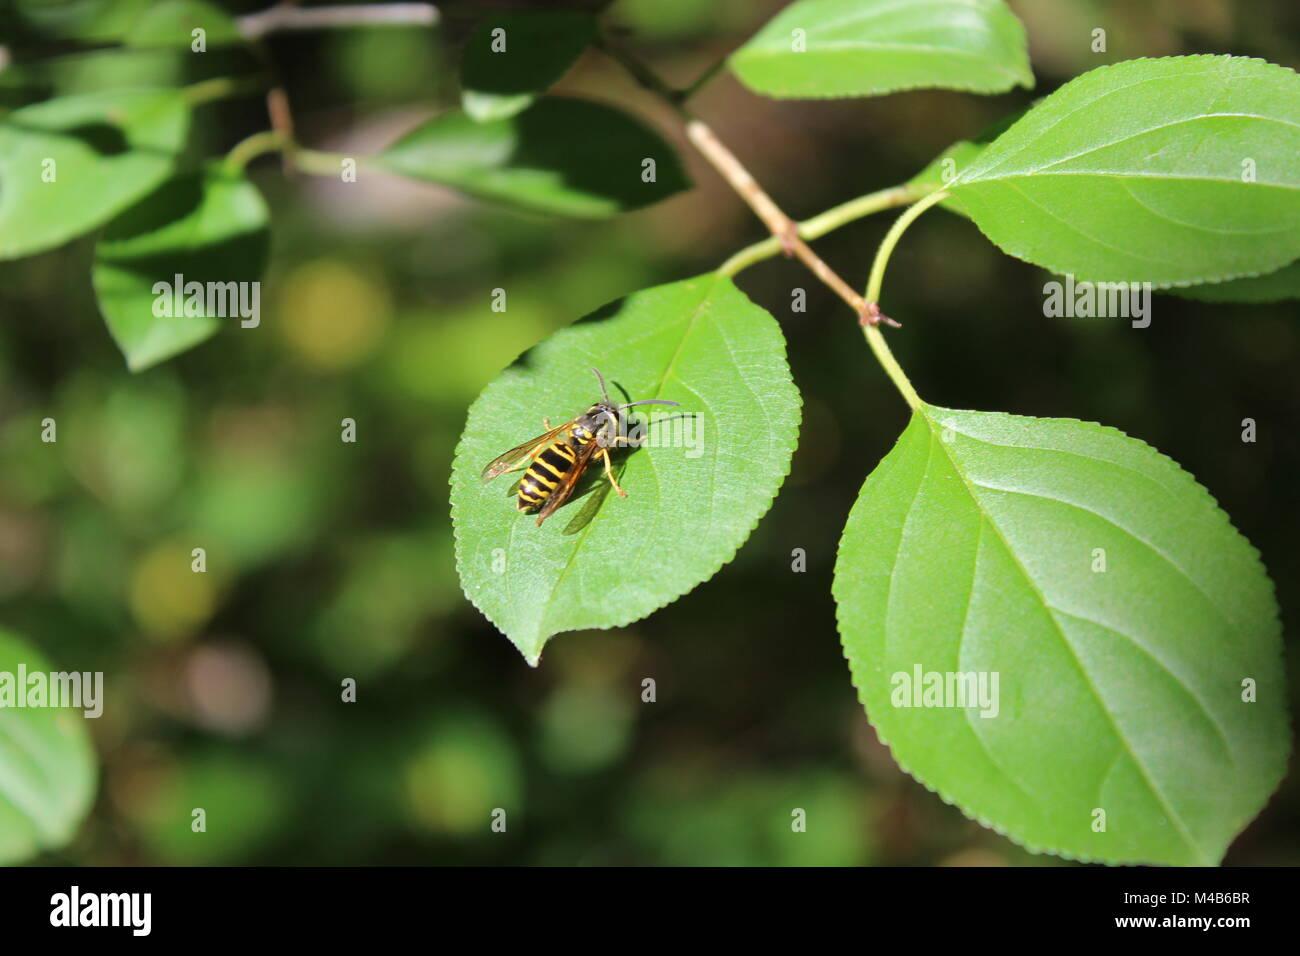 Honey Bee sitting in the sun - Stock Image